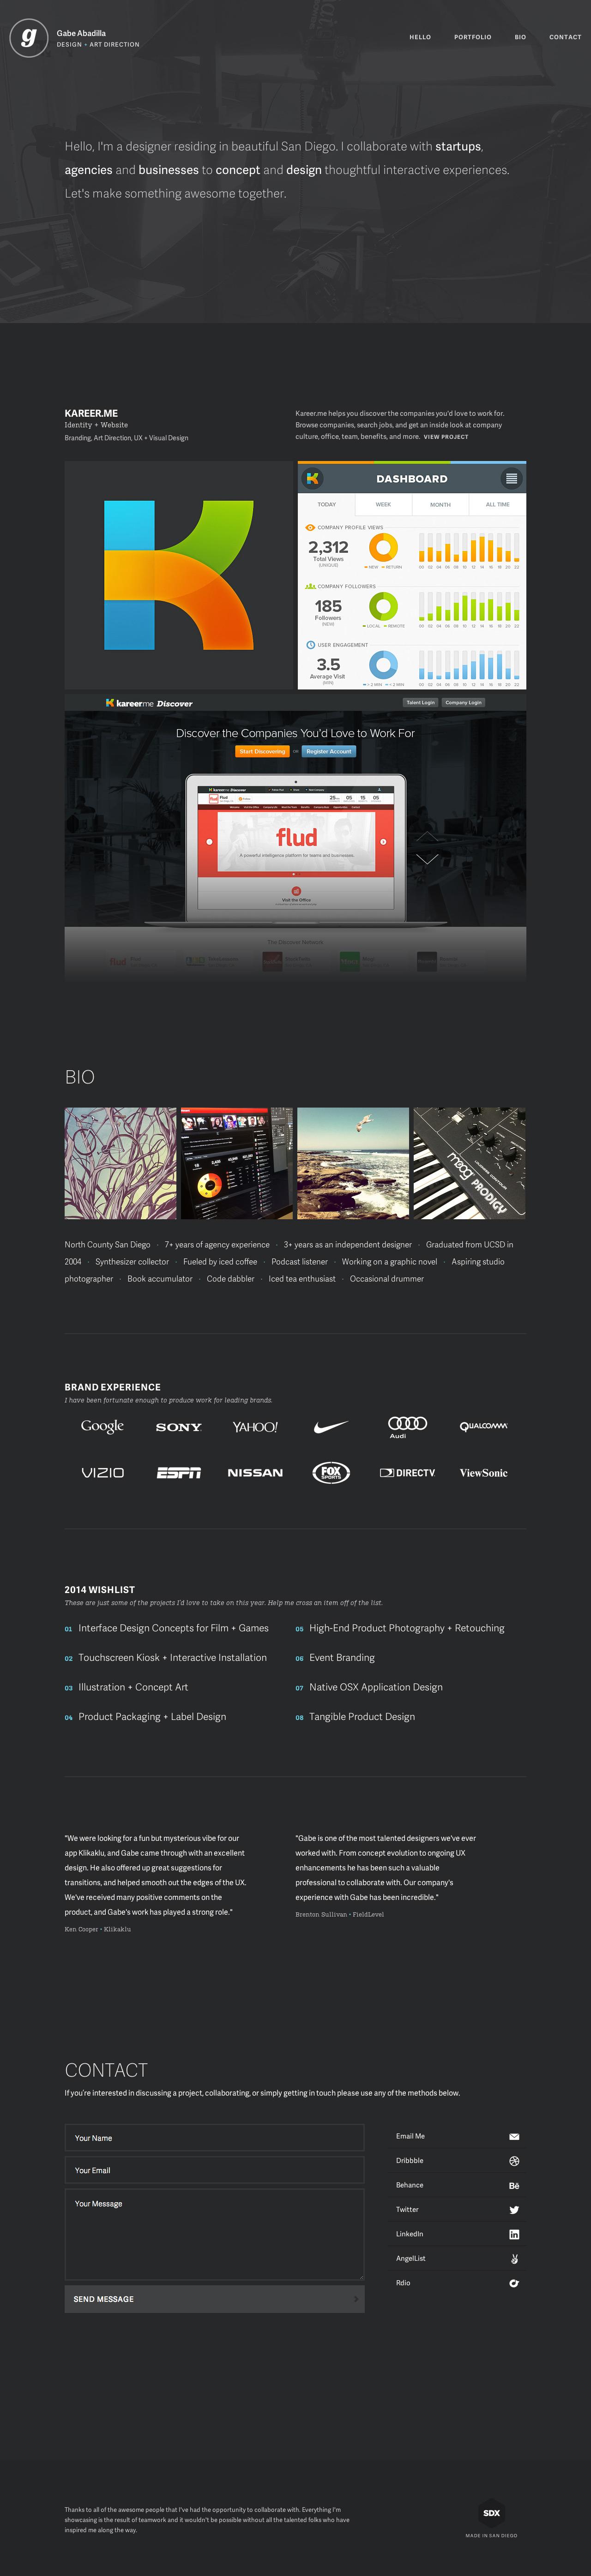 Gabe Abadilla Website Screenshot